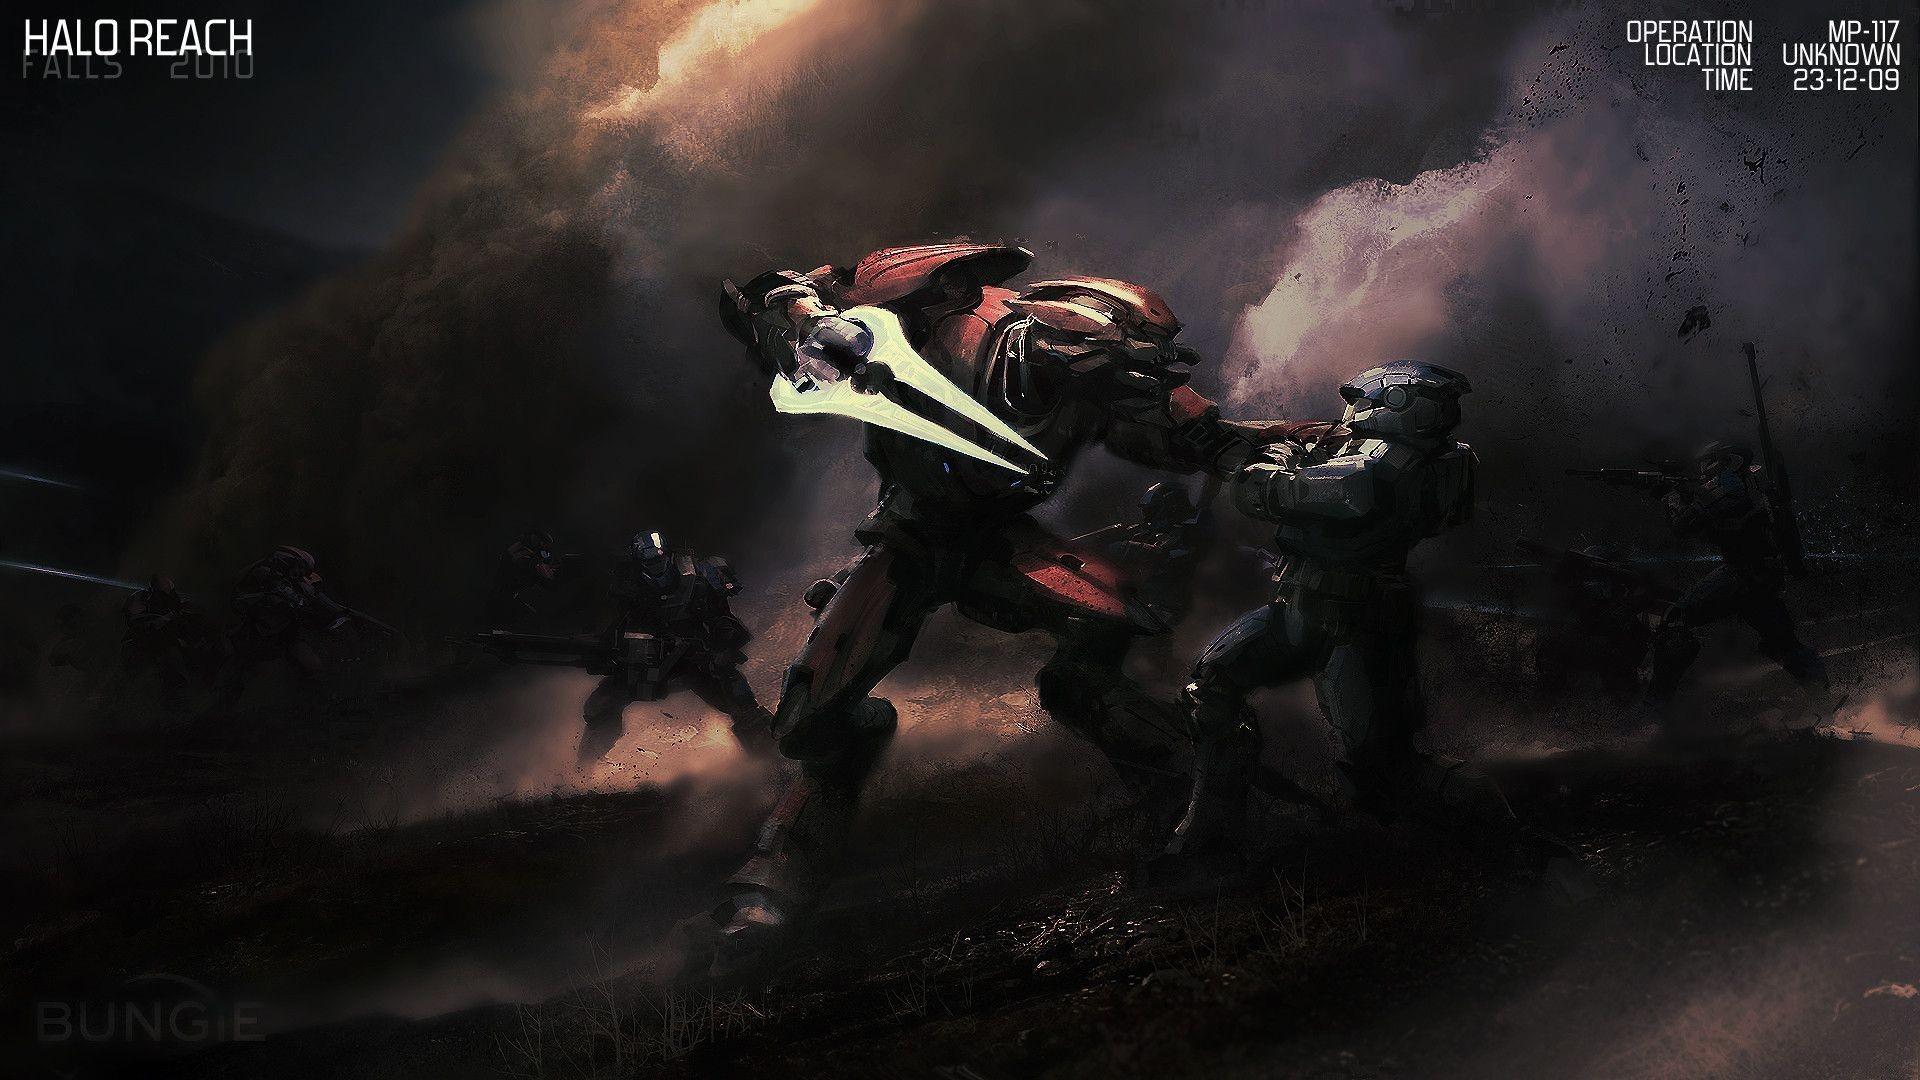 Awesome Halo Backgrounds